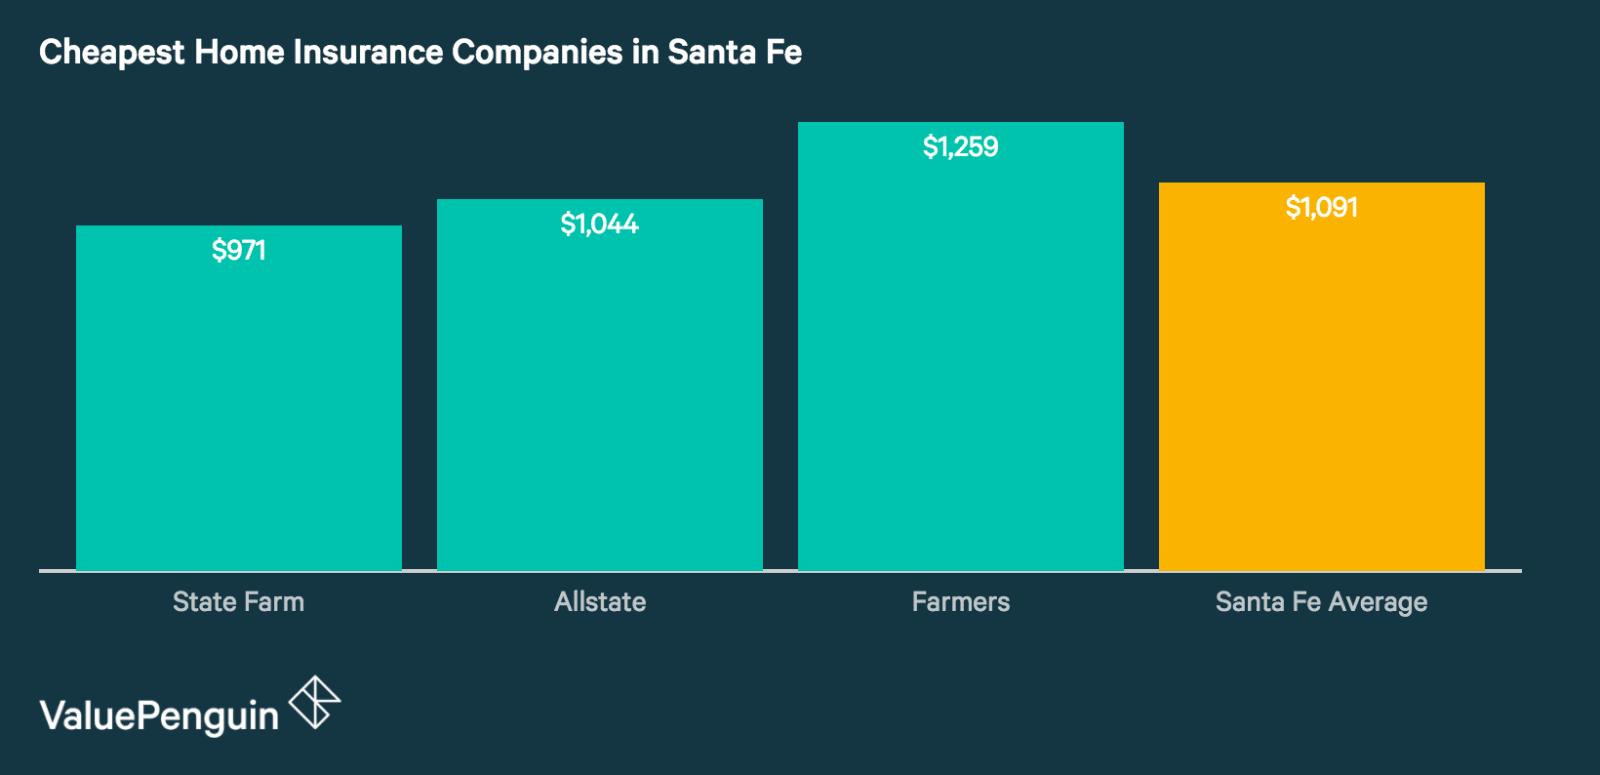 Santa Fe's Best Home Insurance Companies